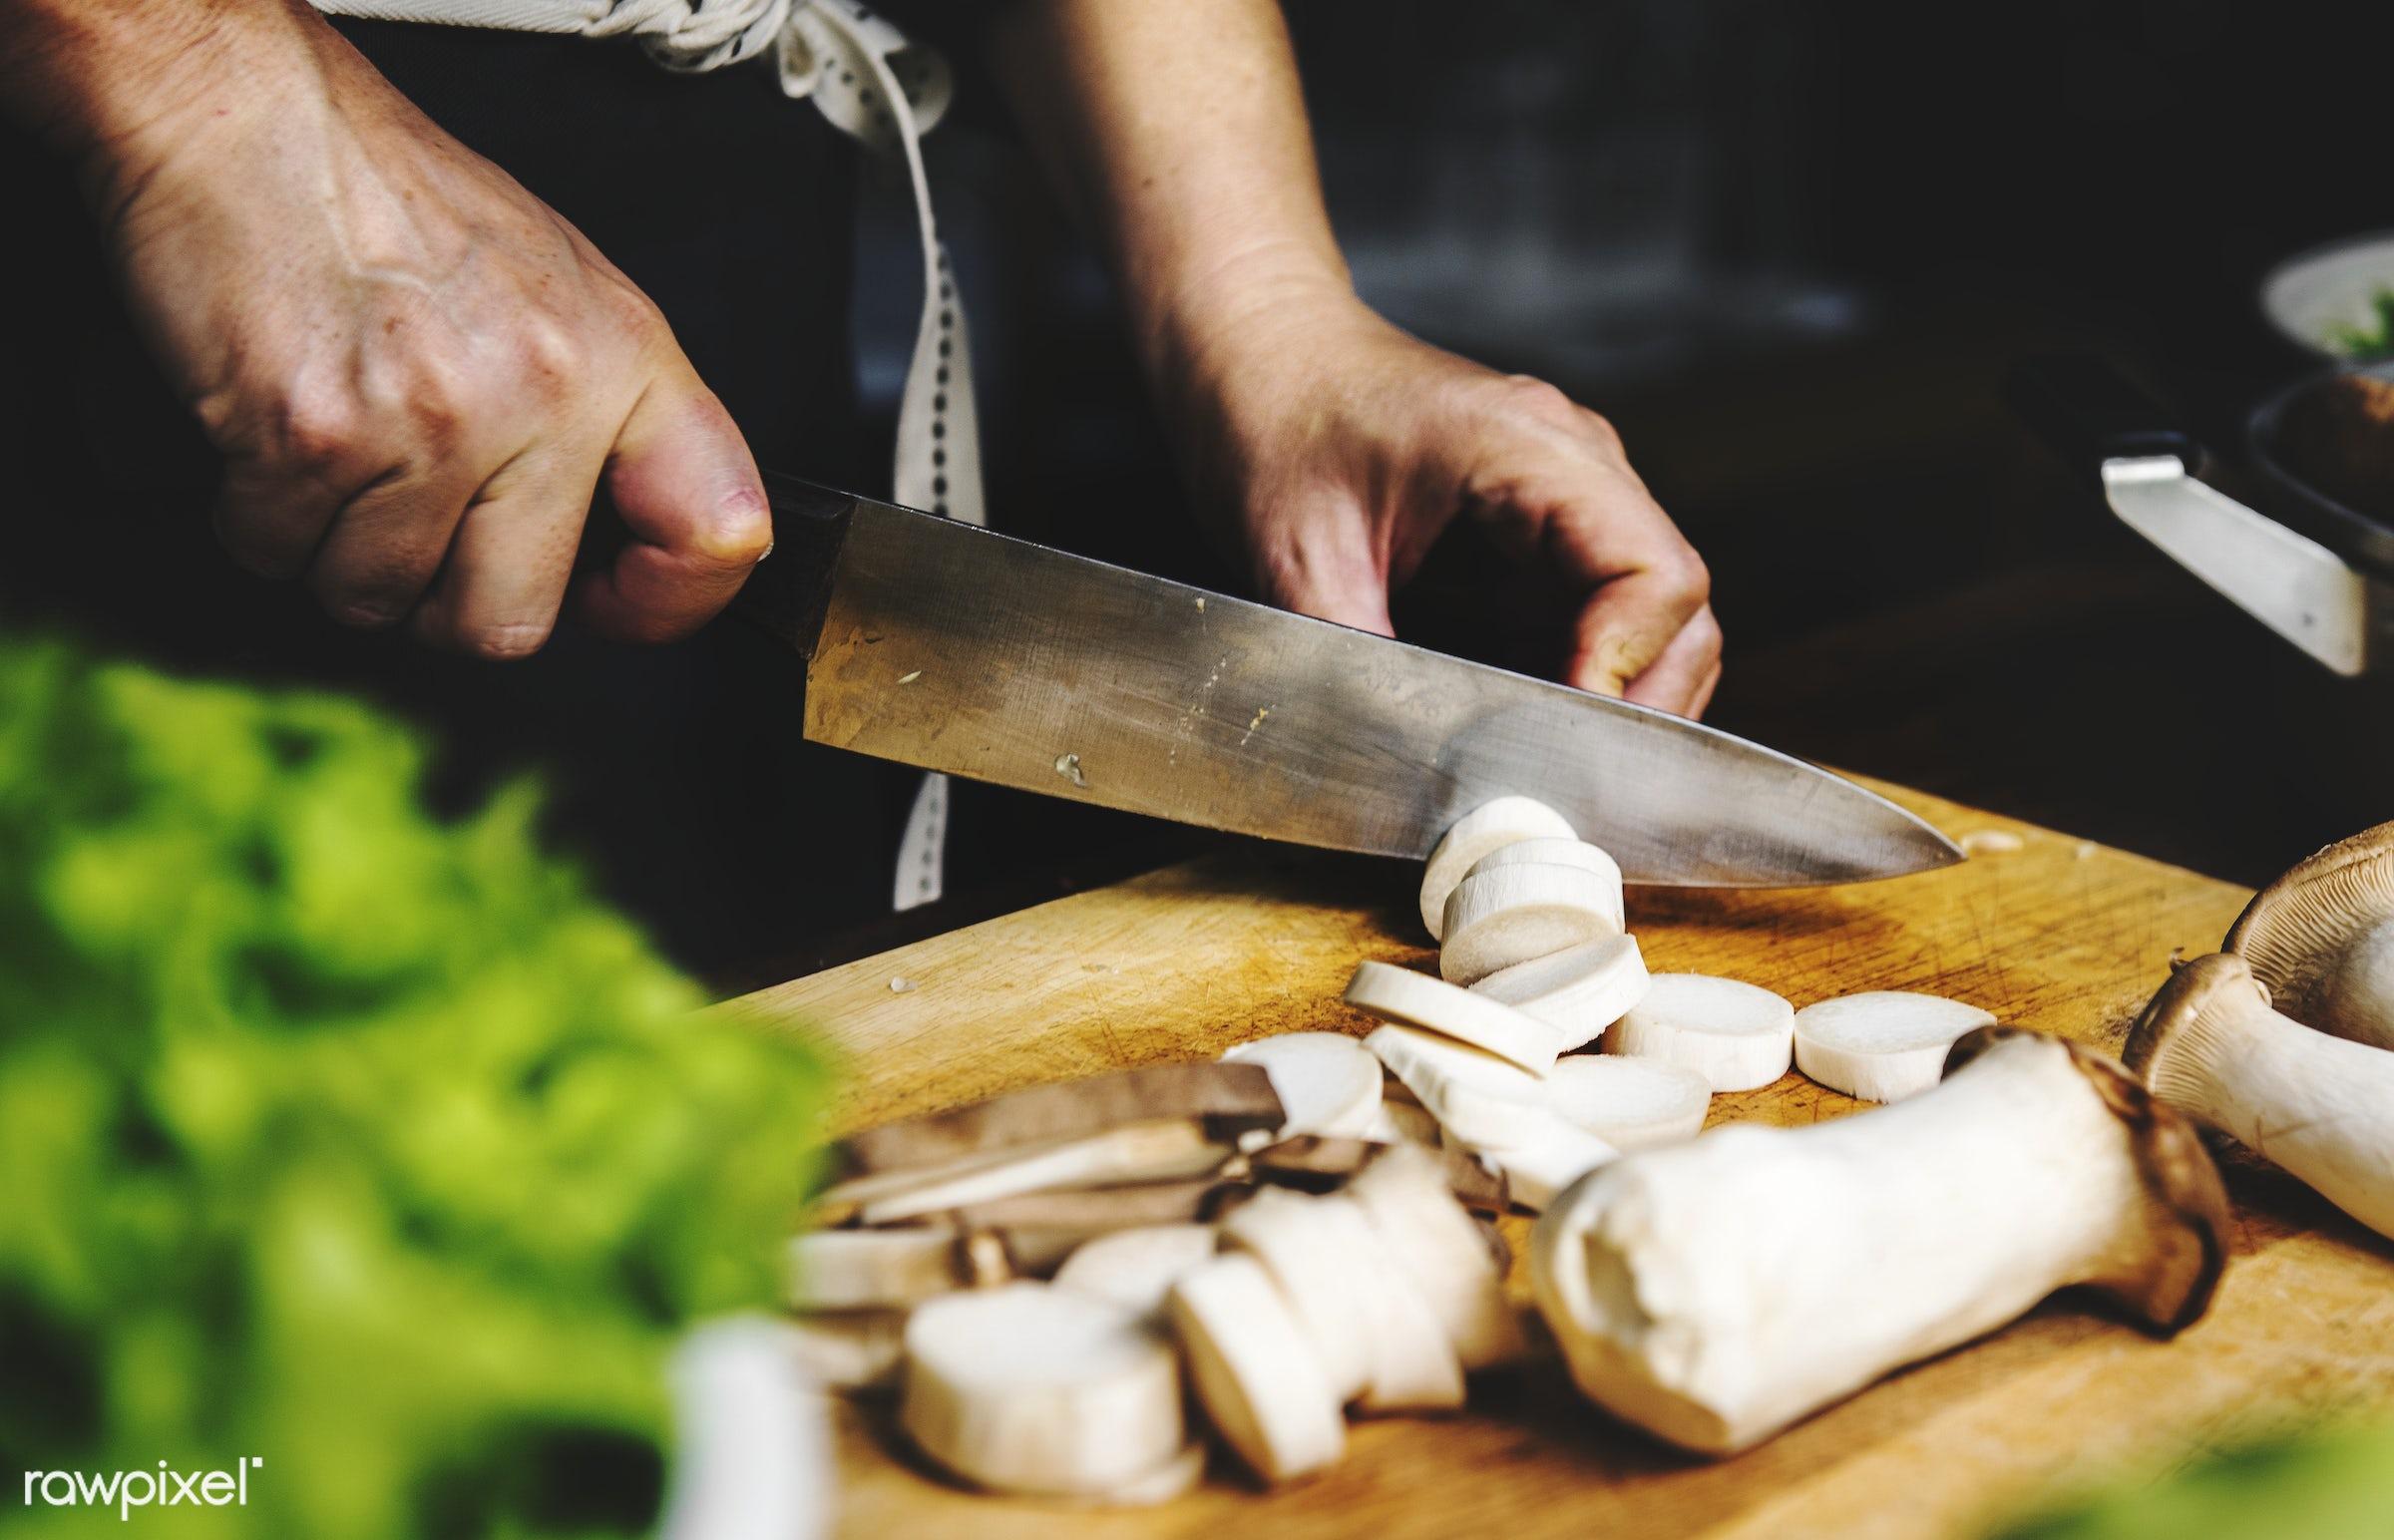 raw, mushroom, diverse, chopping board, farm, ingredients, nature, farmer, fresh, hands, products, closeup, knife, cut board...